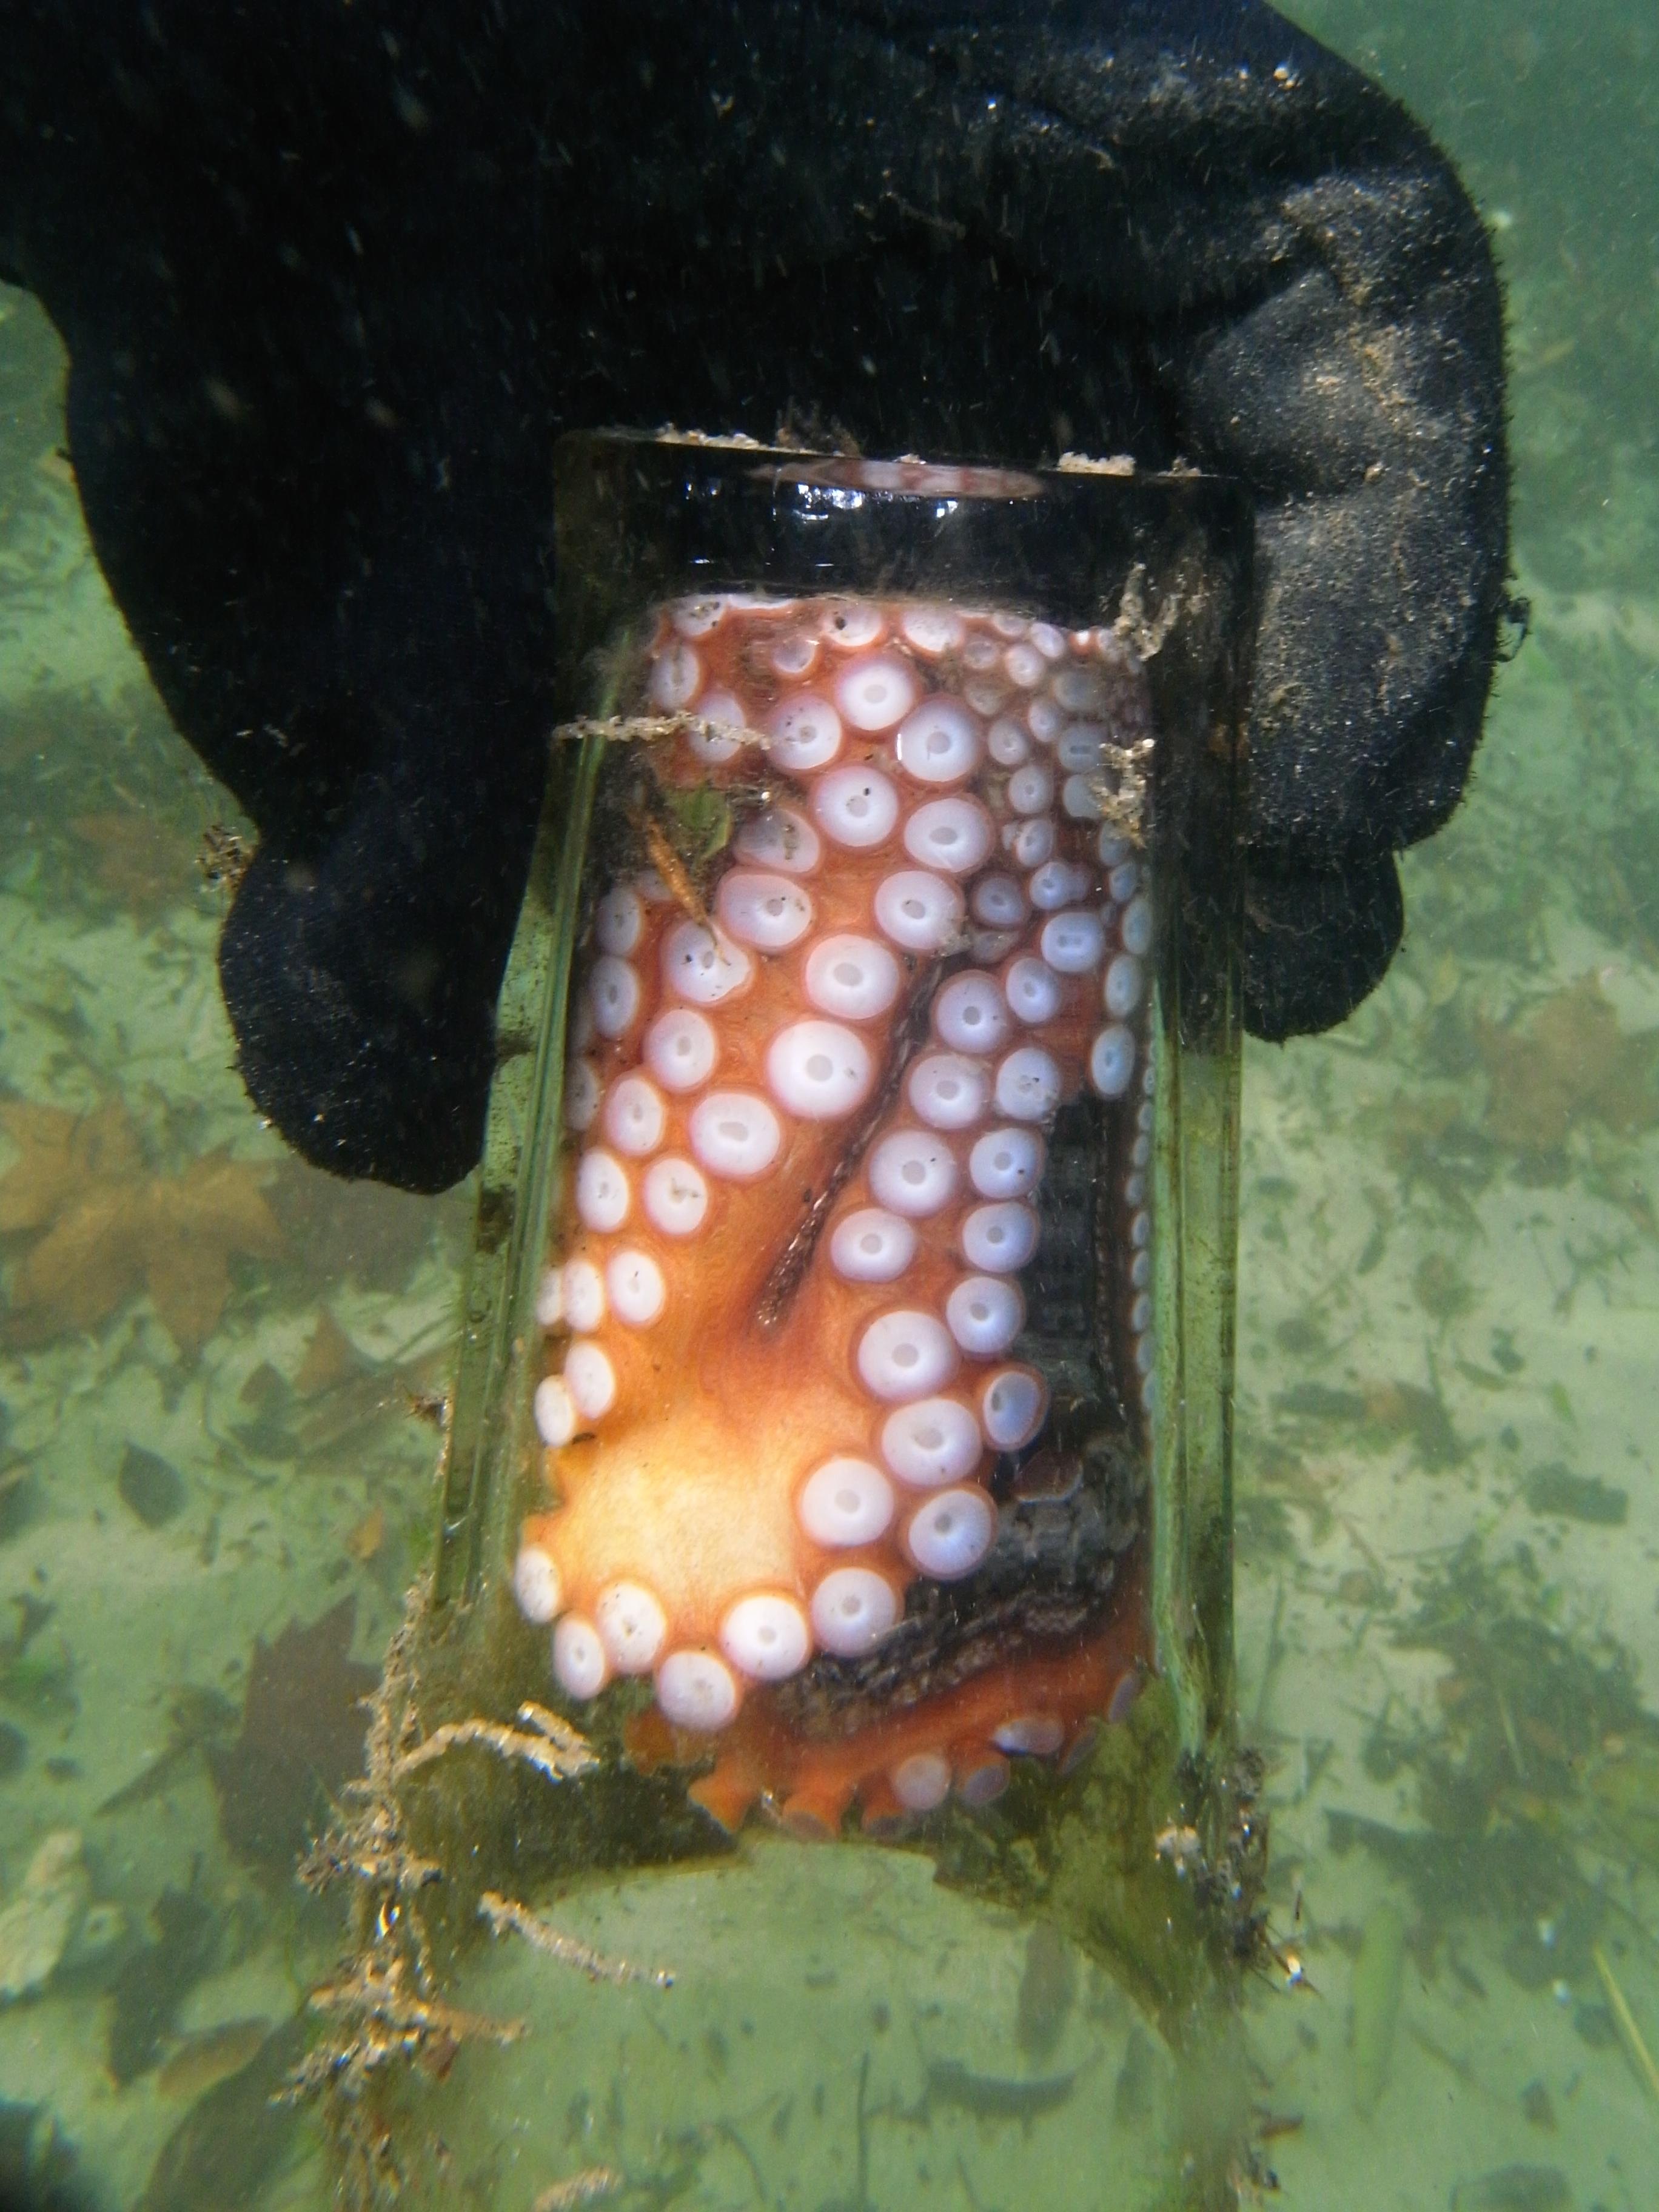 Gloomy Octopus by Sylke Rohrlach